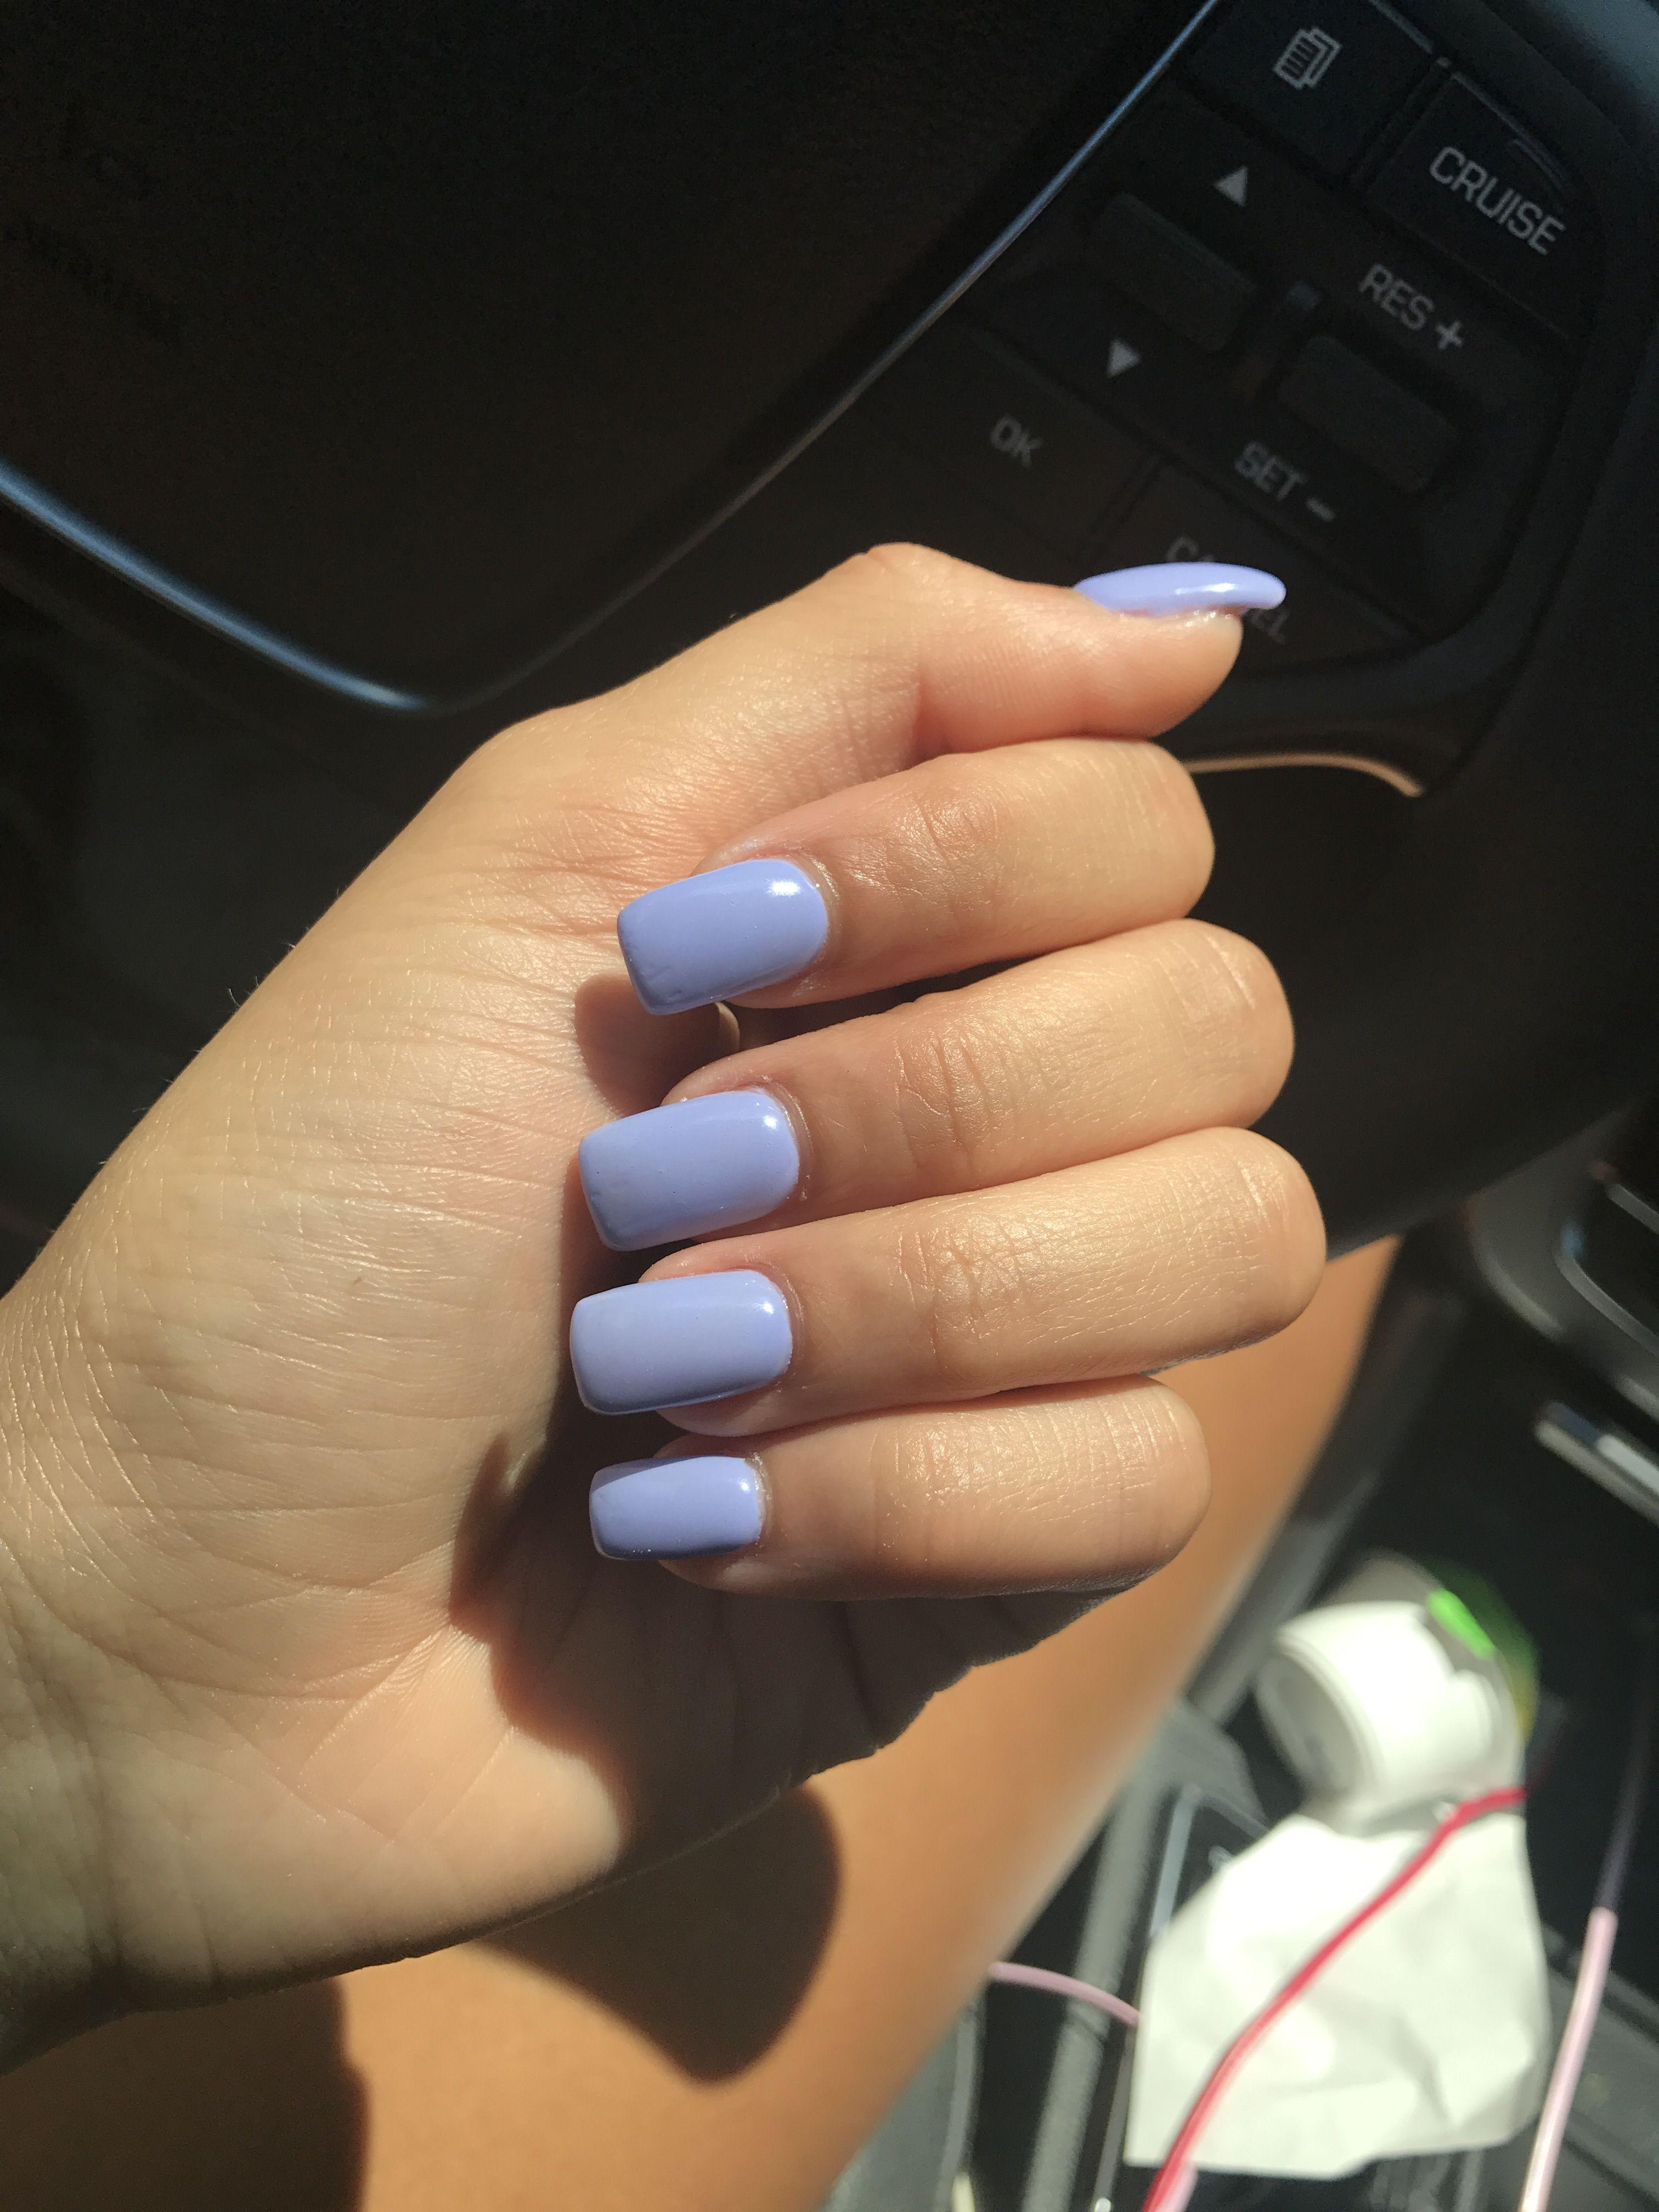 purple nails square nails gel nails - Nagel | Pinterest